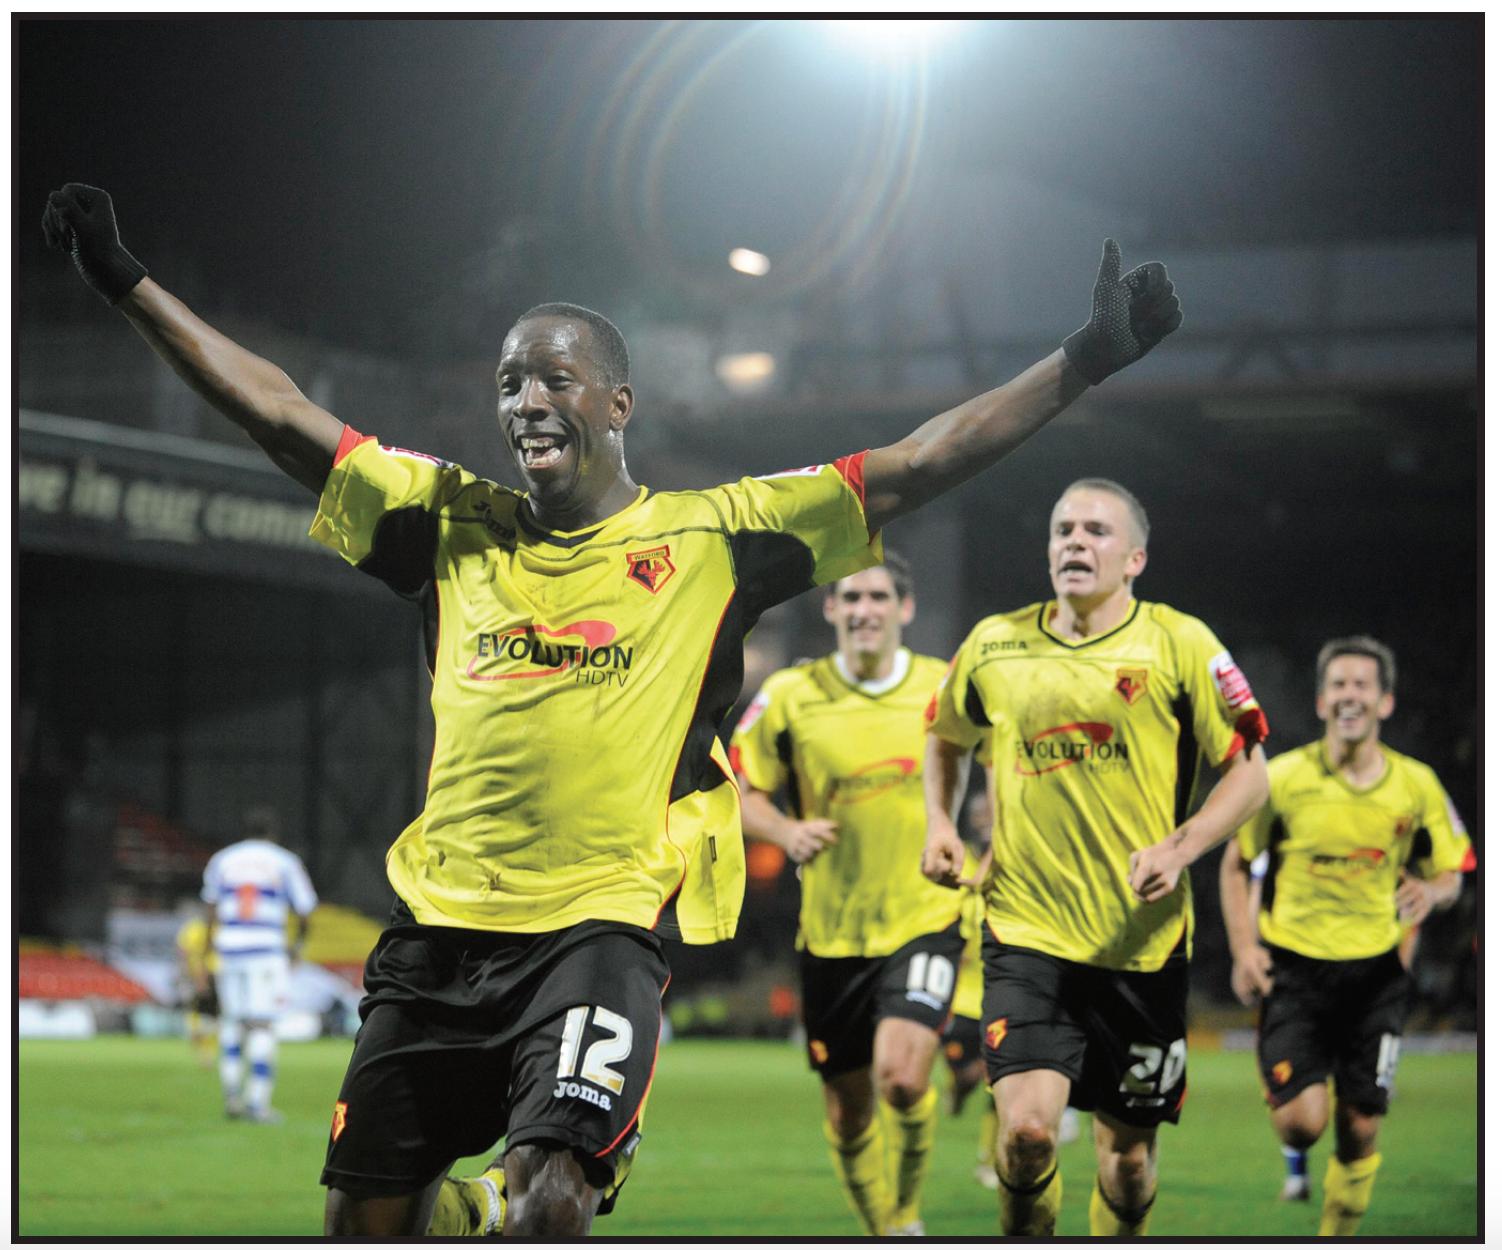 Doyley celebrates his first Watford goal. Photographs by Alan Cozzi